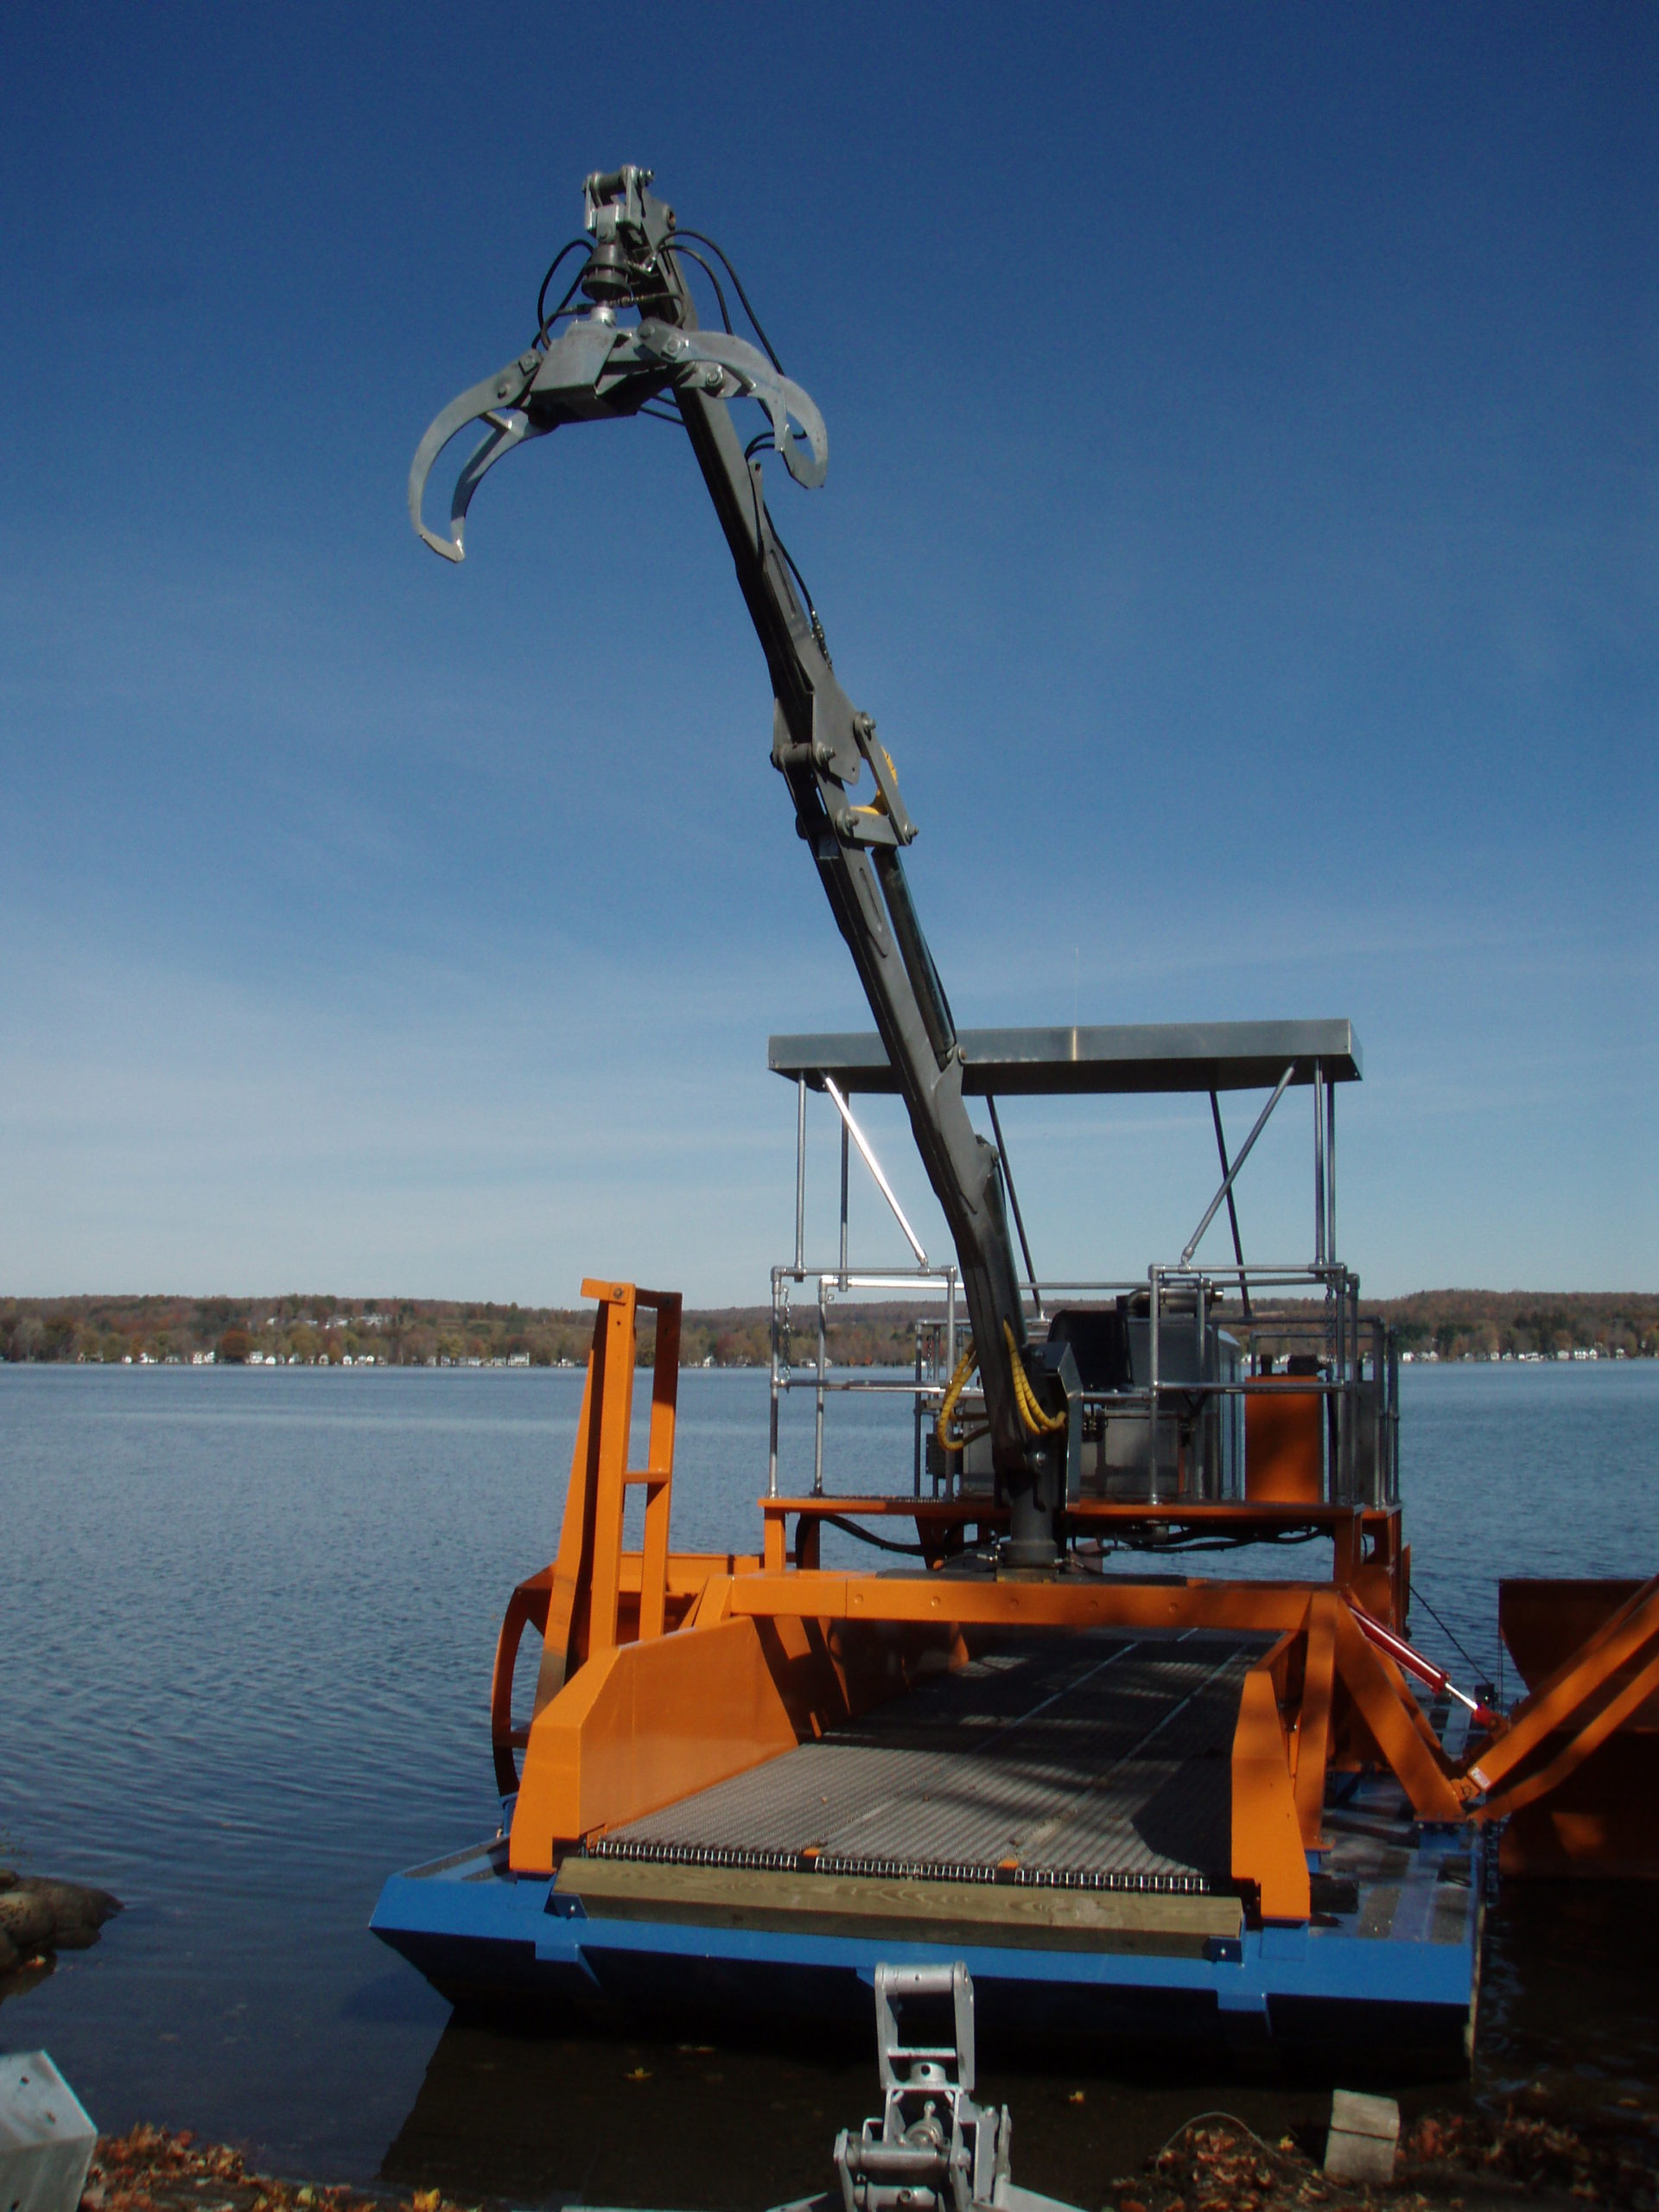 Alphaboats AM2000 Hydro Mate Multi Purpose Waterway Work Boat